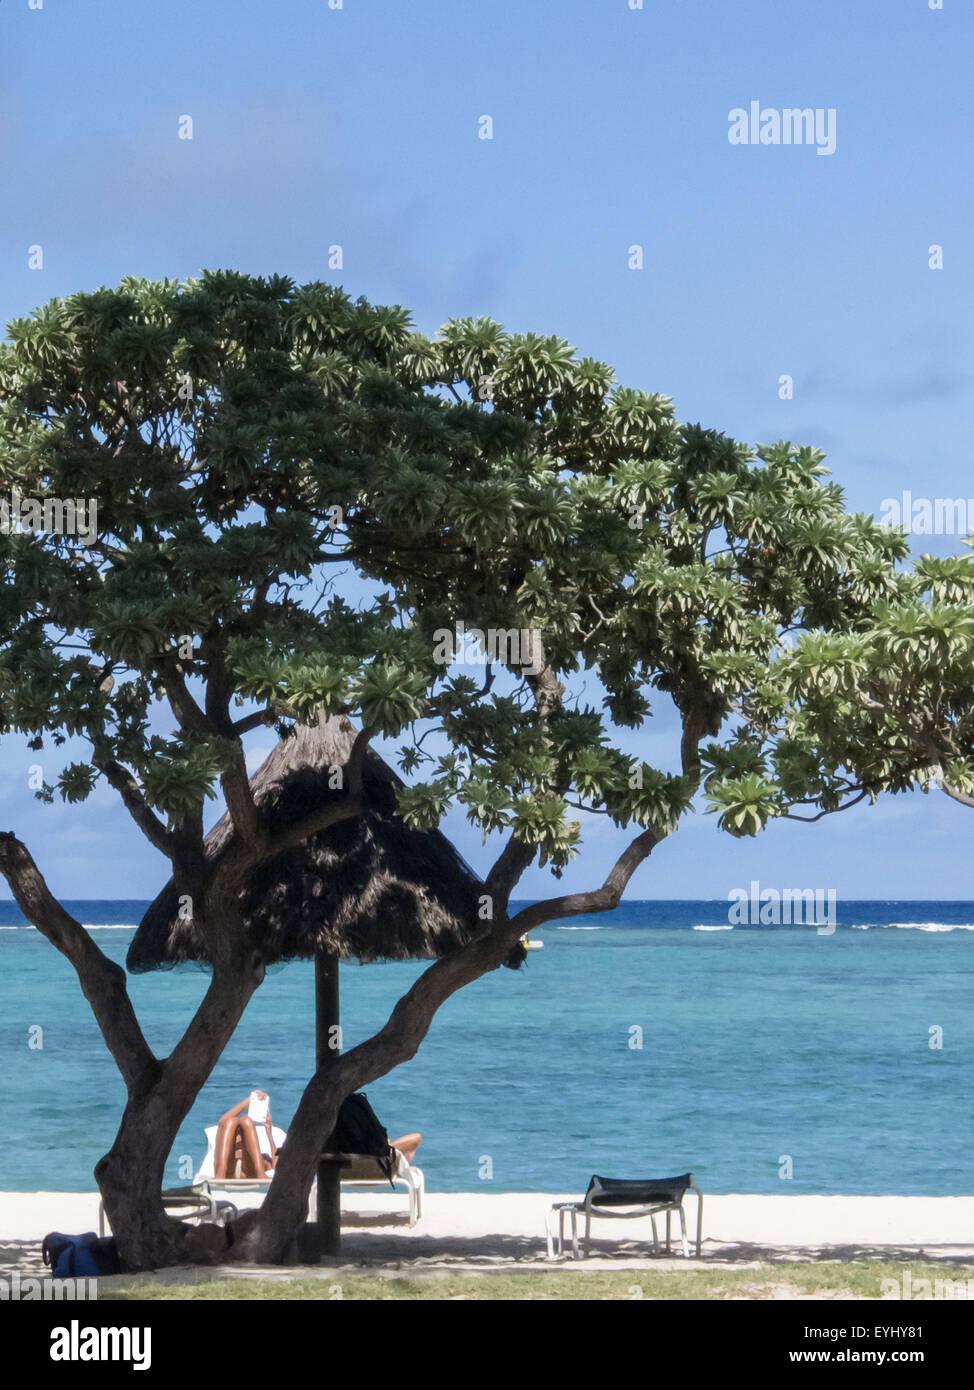 Flic en Flac, Mauritius. La Pirogue tourist resort. Sunlounger, tree and sea. Stock Photo